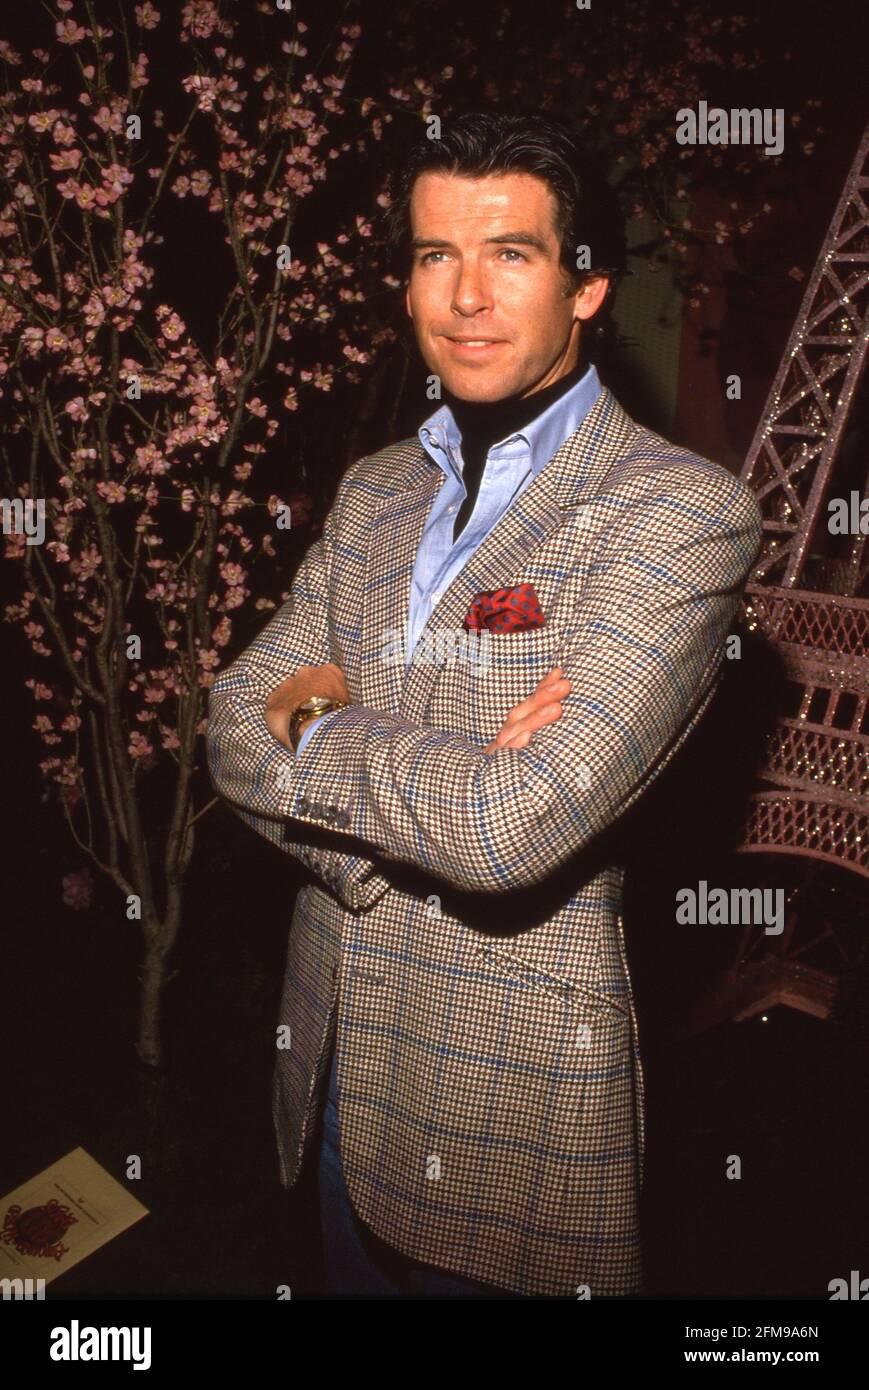 Pierce Brosnan Circa 1980's Crédito: Ralph Dominguez/MediaPunch Foto de stock